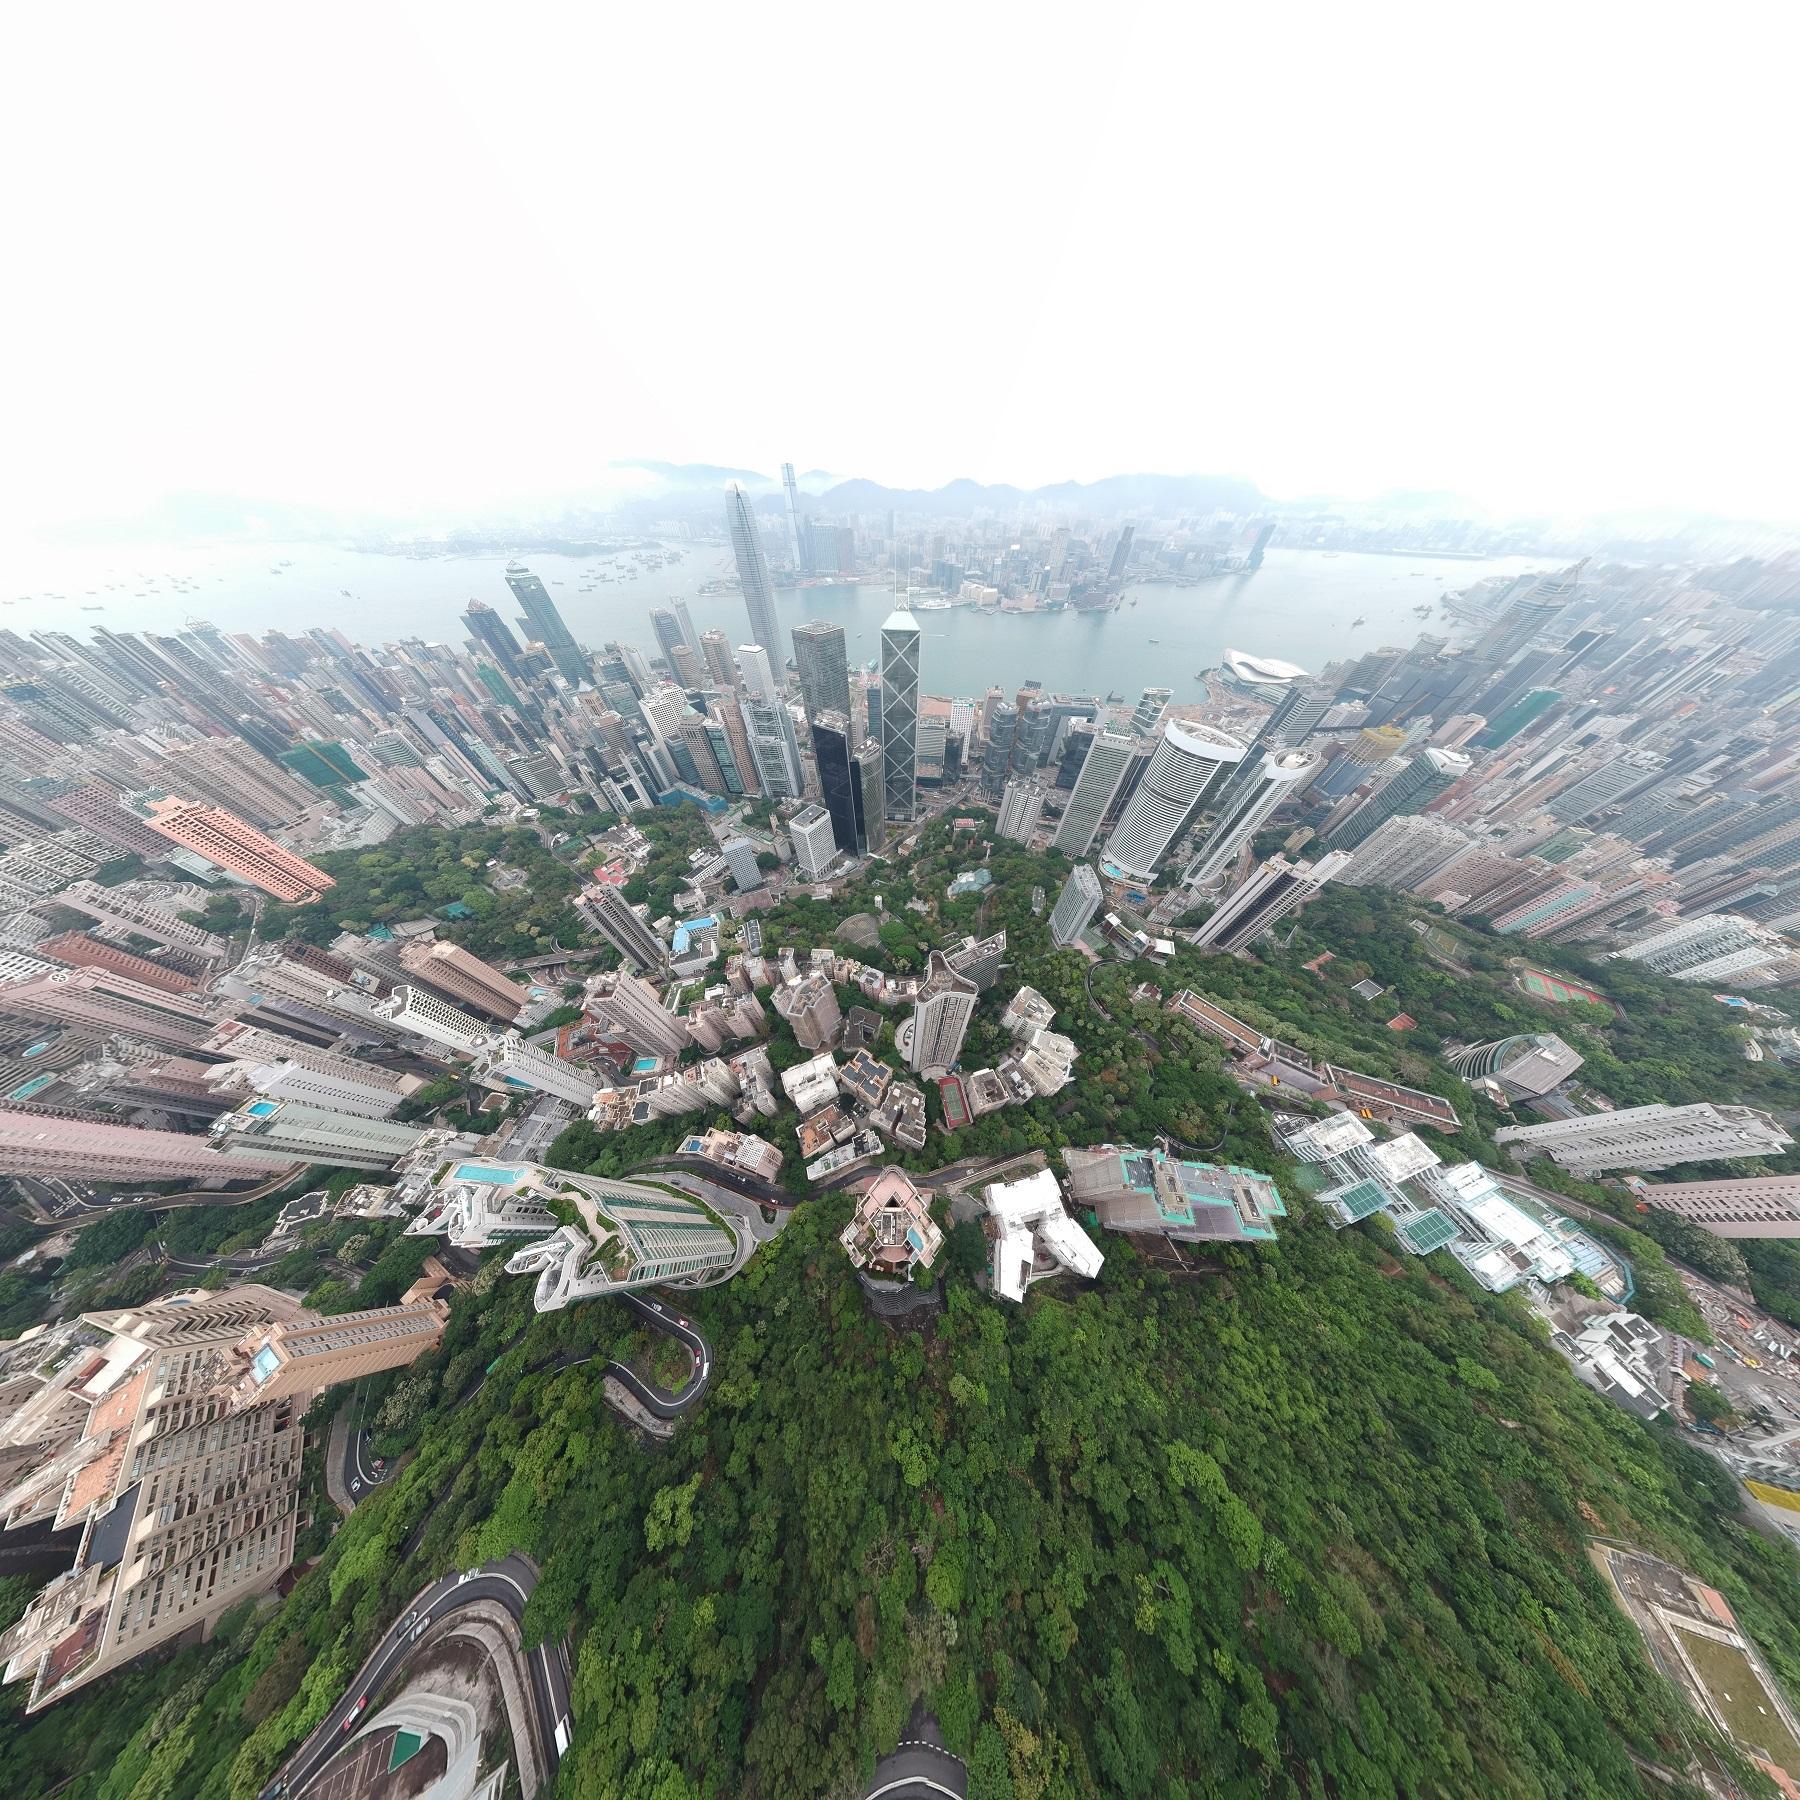 Hongkong Islan views with DJI Spark and Ms ICE